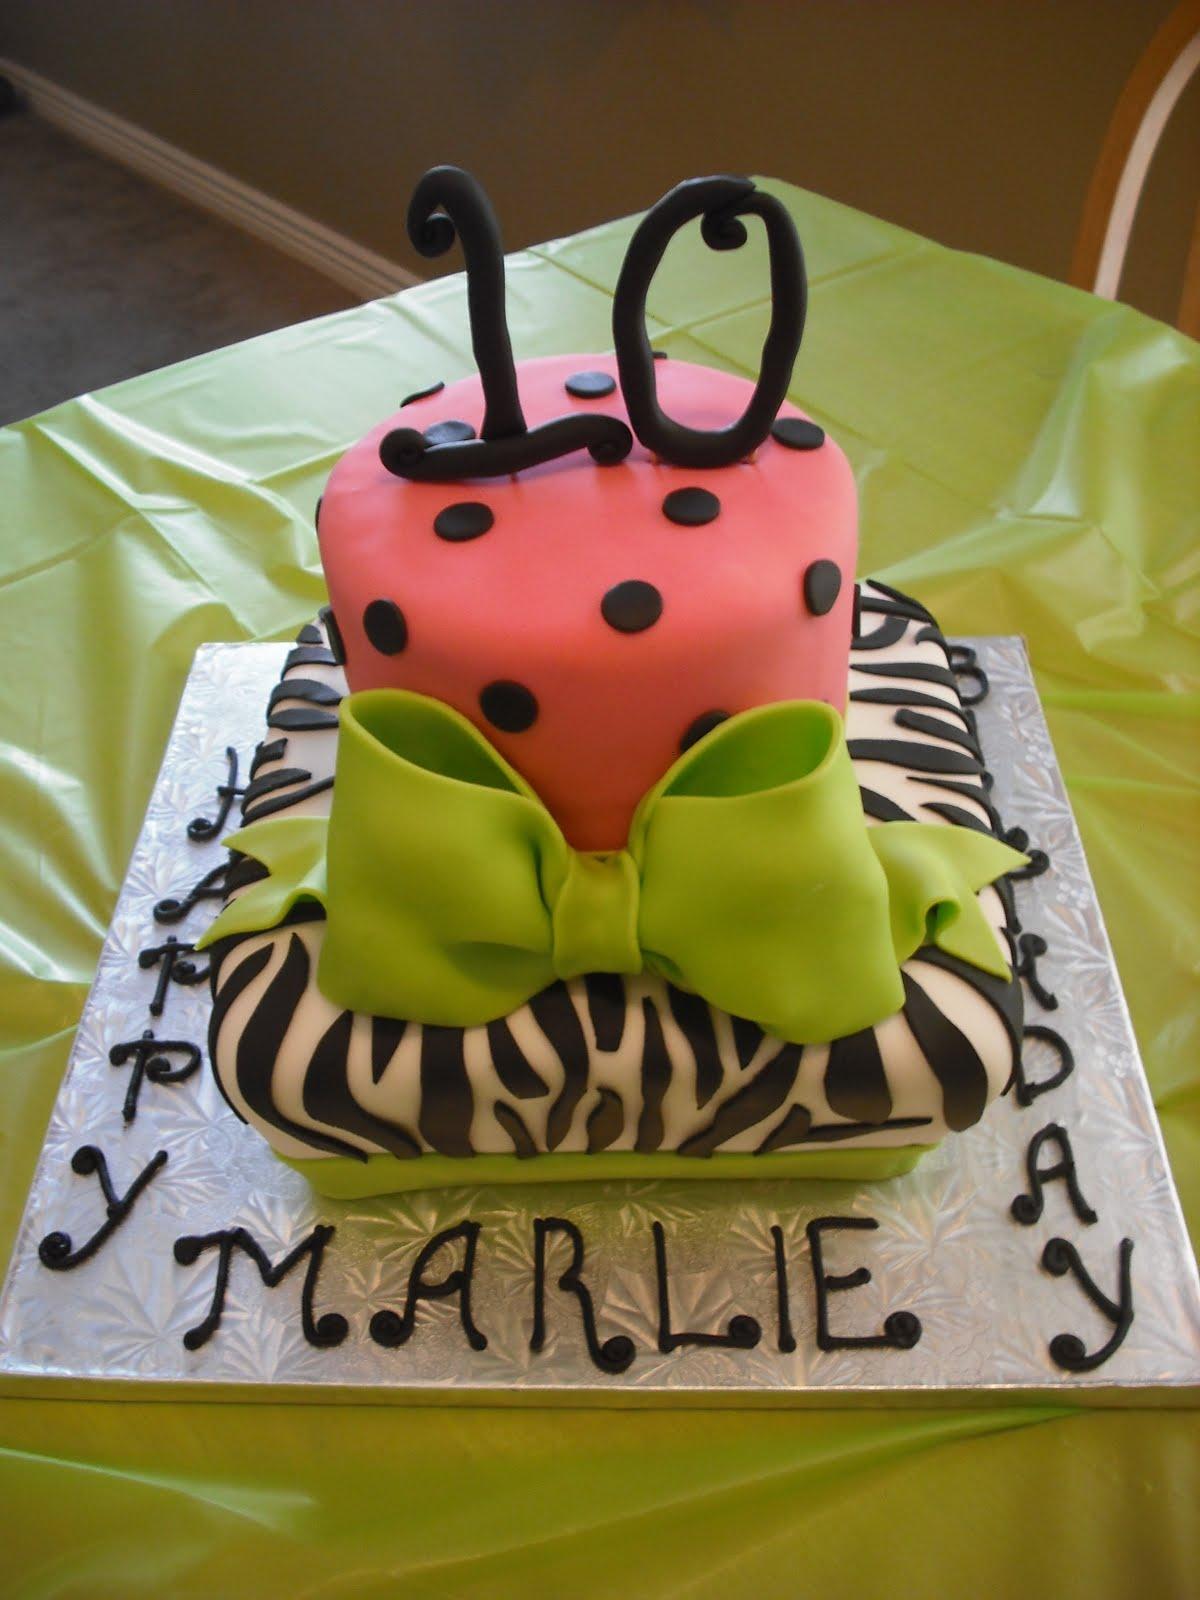 Cake Images Print : Sprinklebelle Cakes: Zebra Print Birthday Cake